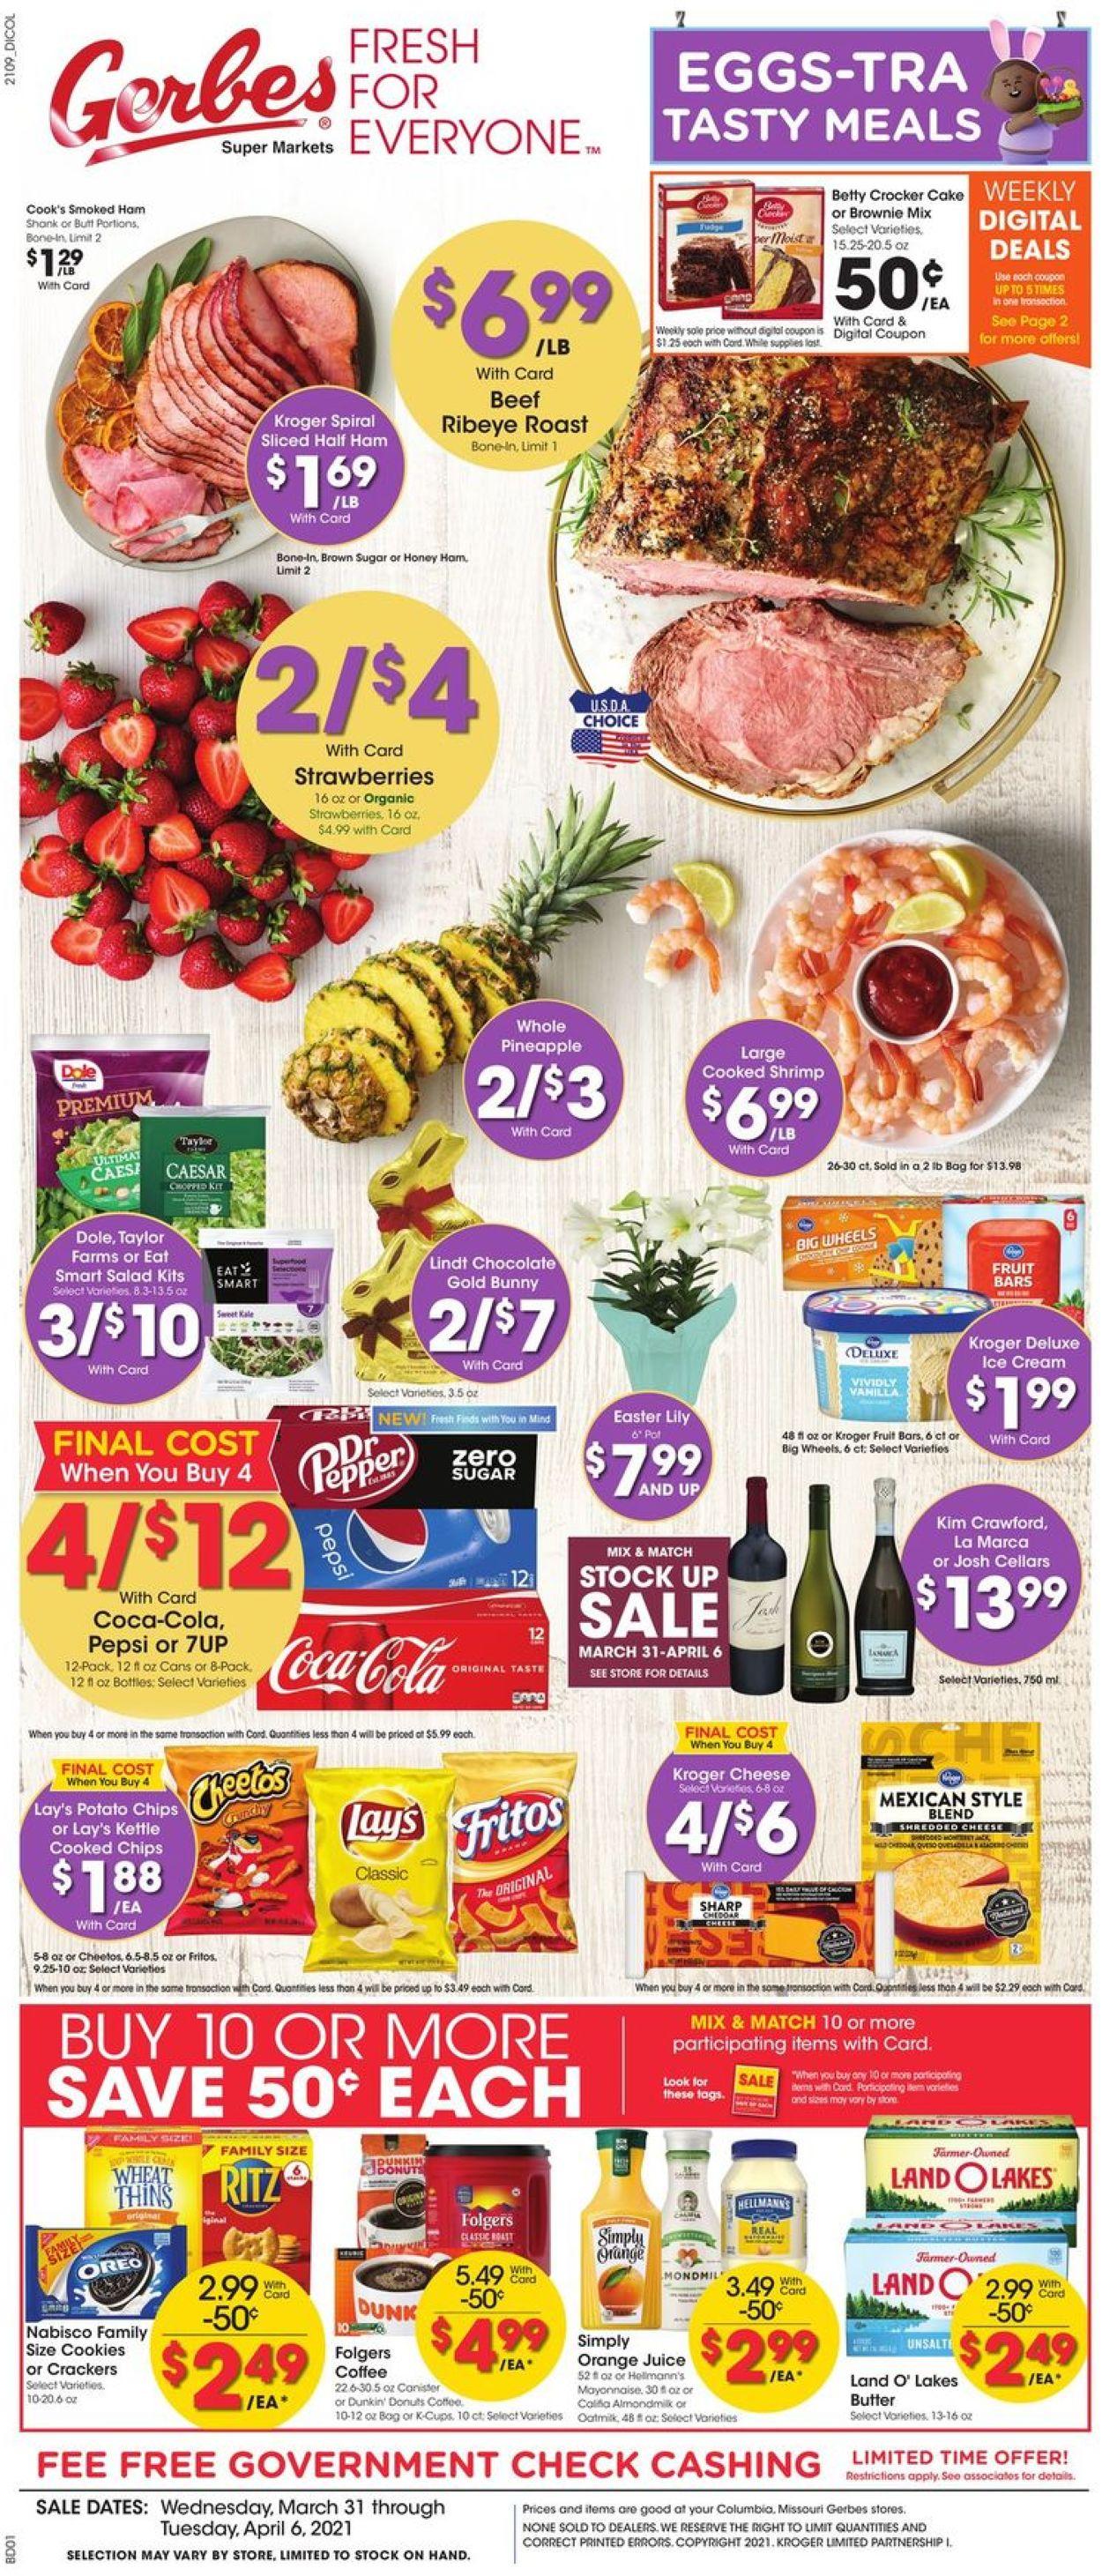 Gerbes Super Markets - Easter 2021 ad Weekly Ad Circular - valid 03/31-04/06/2021